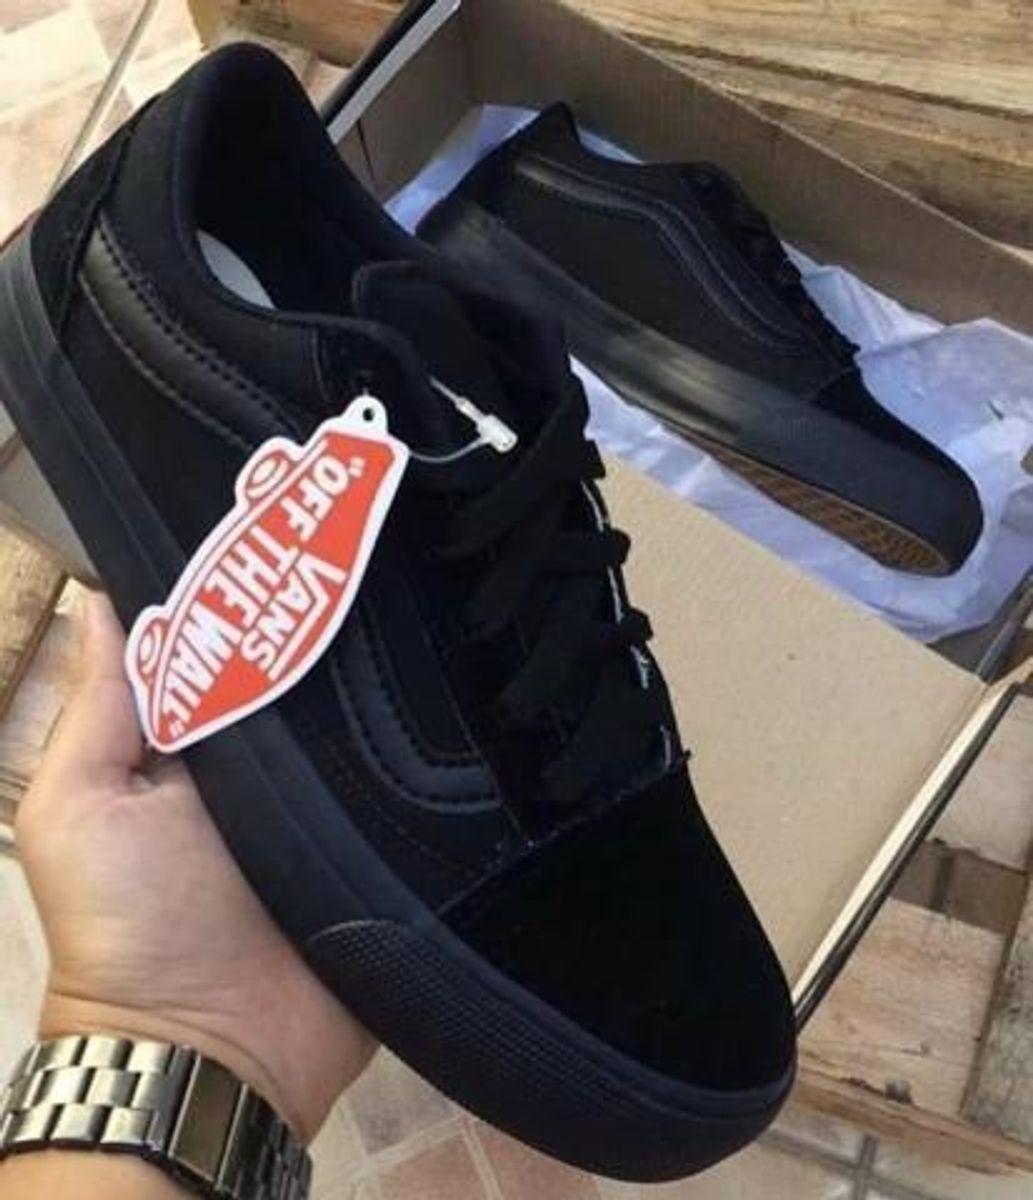 al menos A pie Abundante  Oferta Promoção Tênis Vans Old Skool Comfycush Black Black #Diadospais |  Tênis Masculino Vans Nunca Usado 44319516 | enjoei